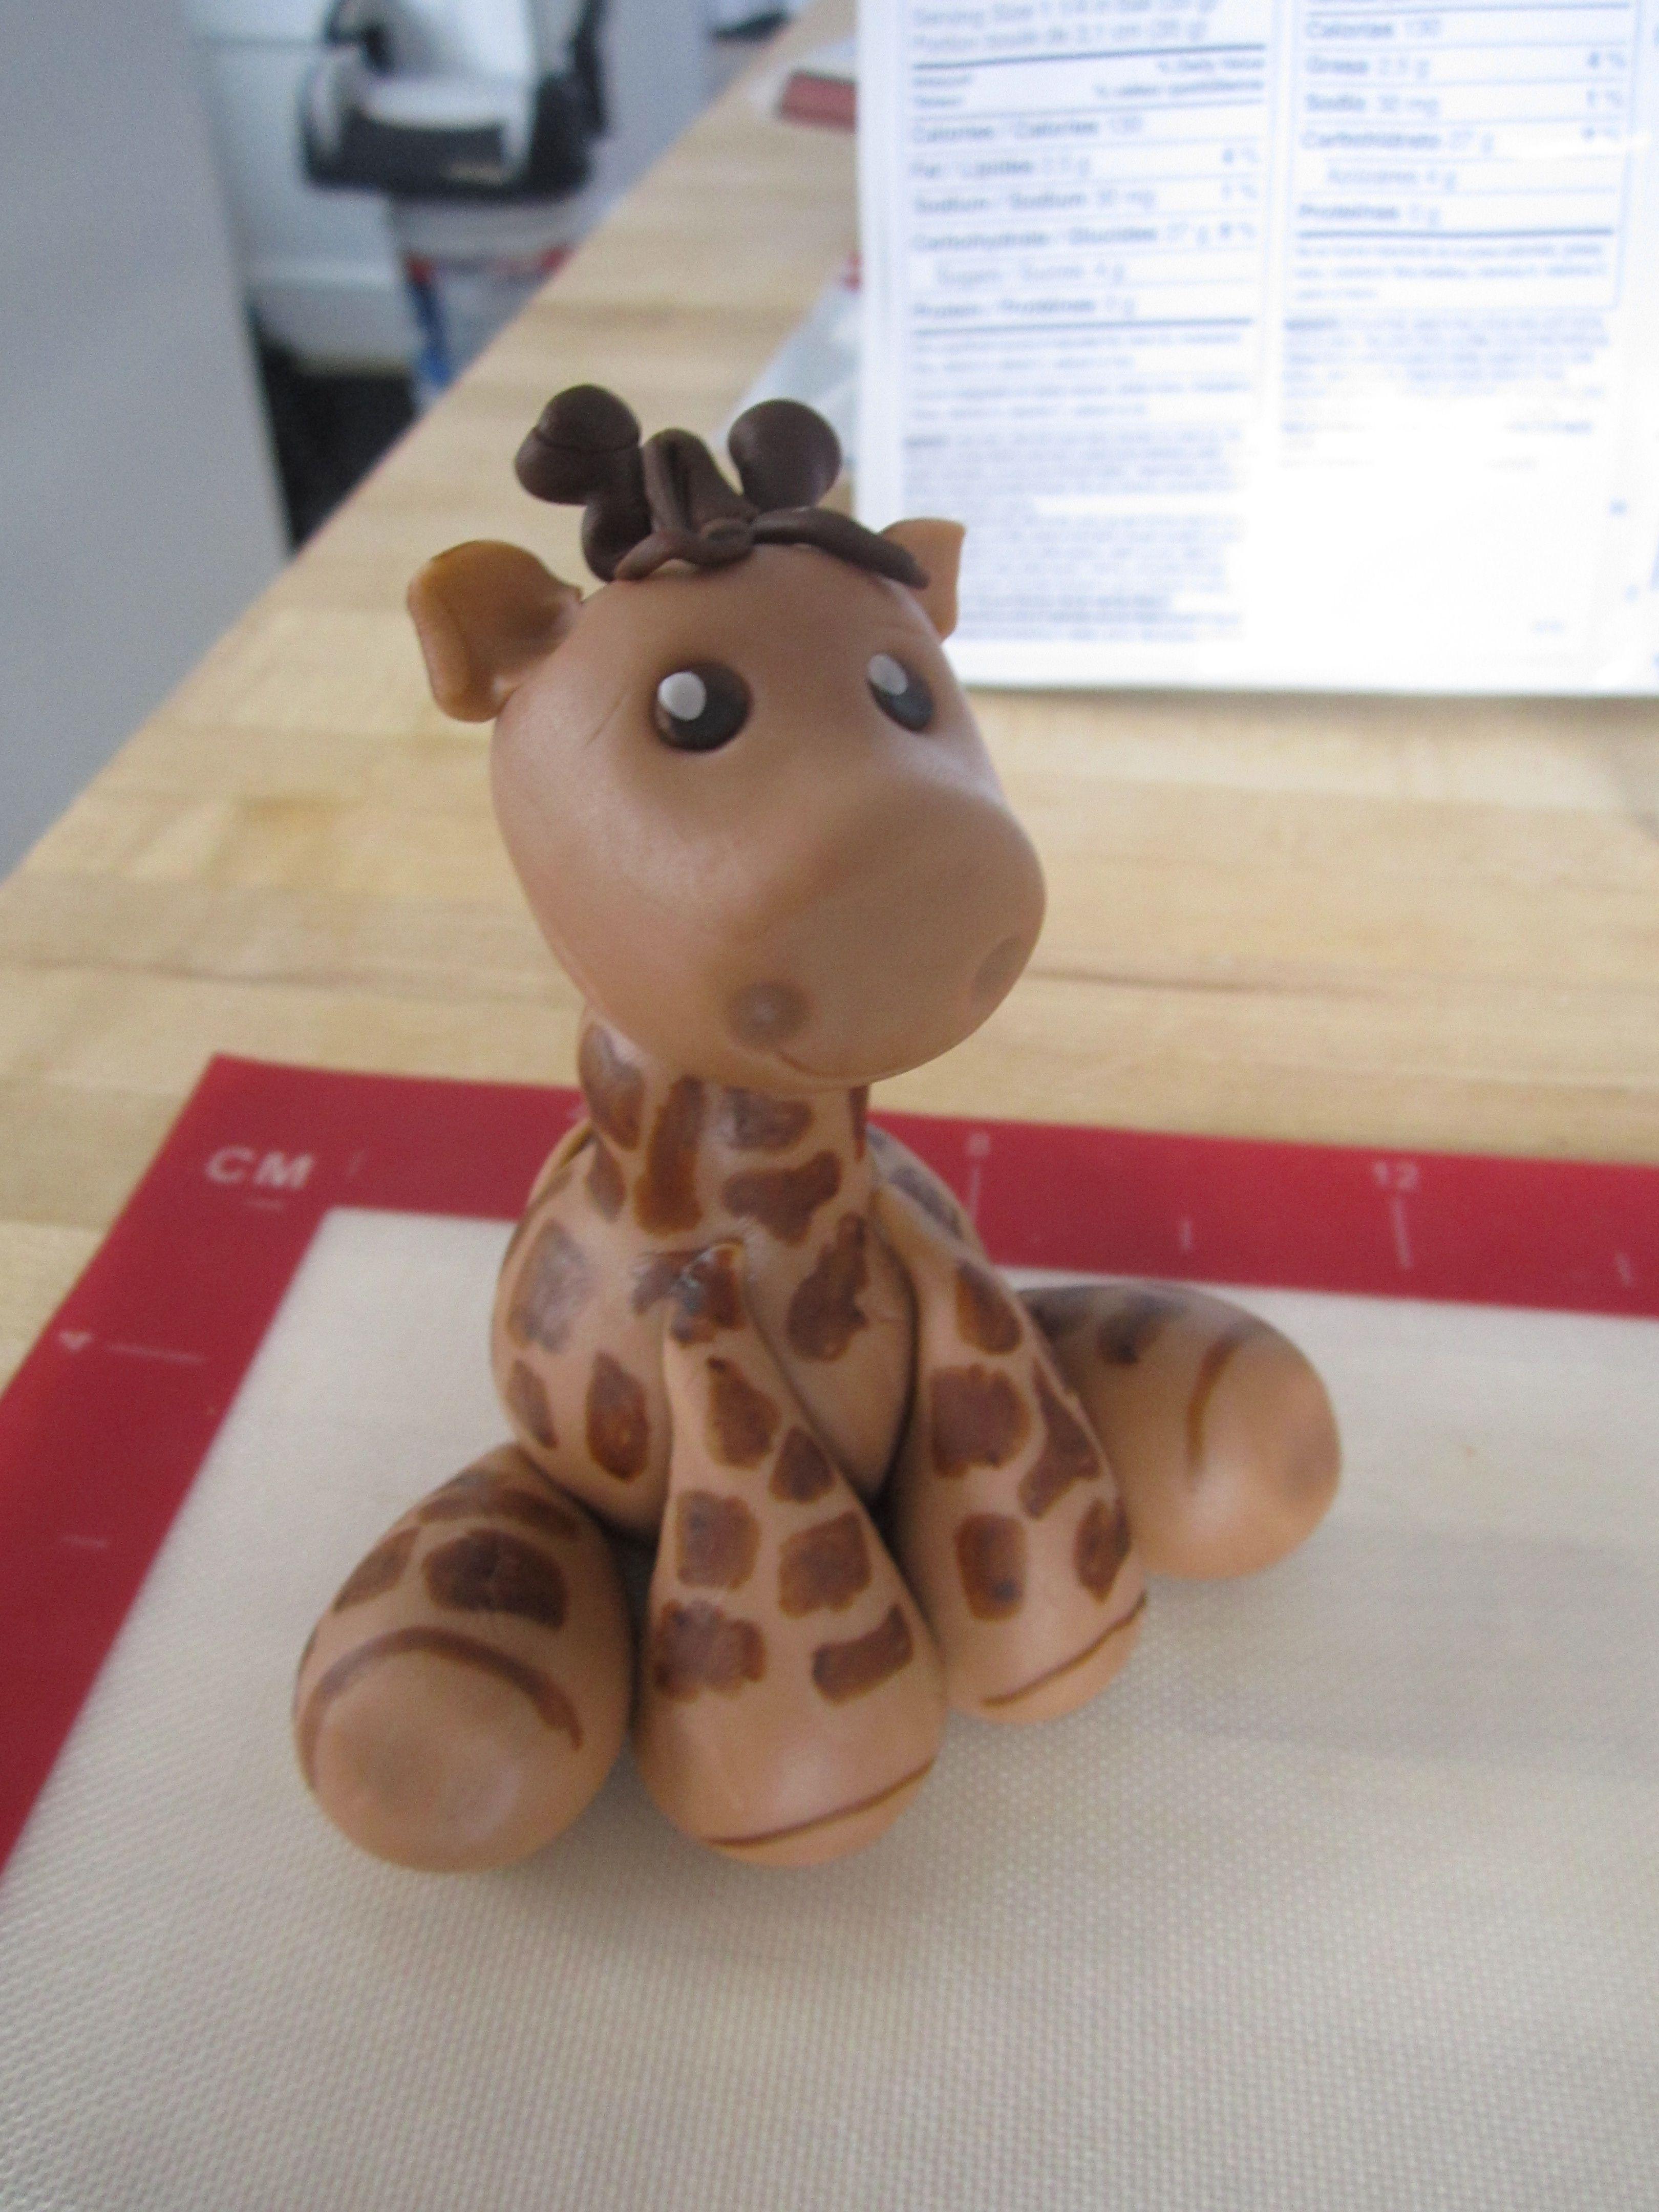 girafe en p te modeler comestible pate fimo pinterest girafes p tes et sels. Black Bedroom Furniture Sets. Home Design Ideas